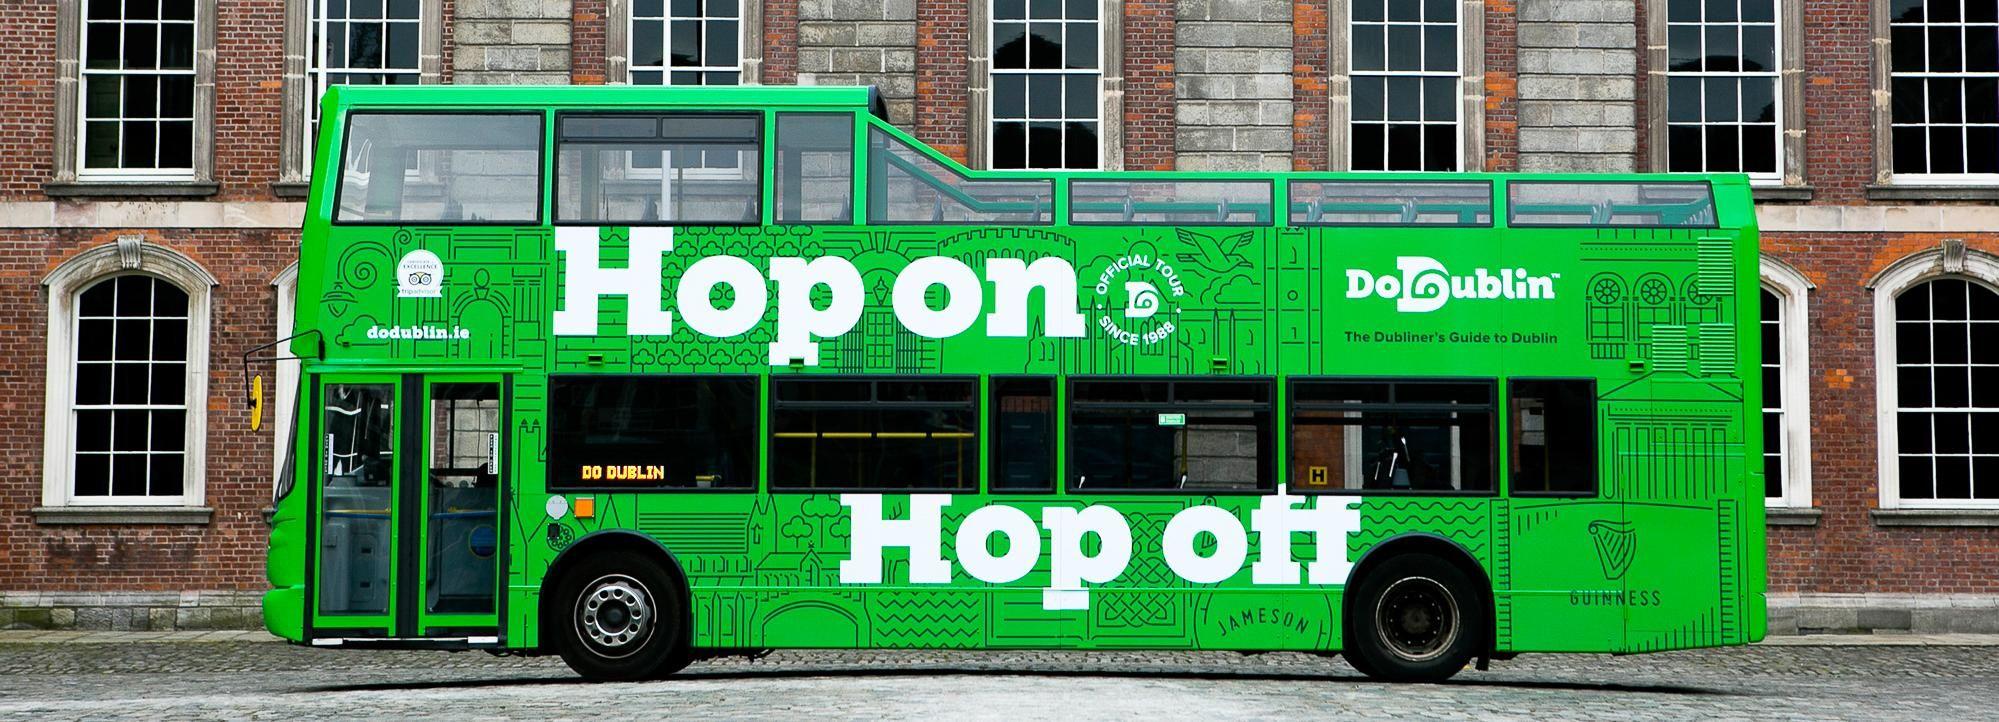 Дублин: тур на hop-on hop-off автобусе DoDublin